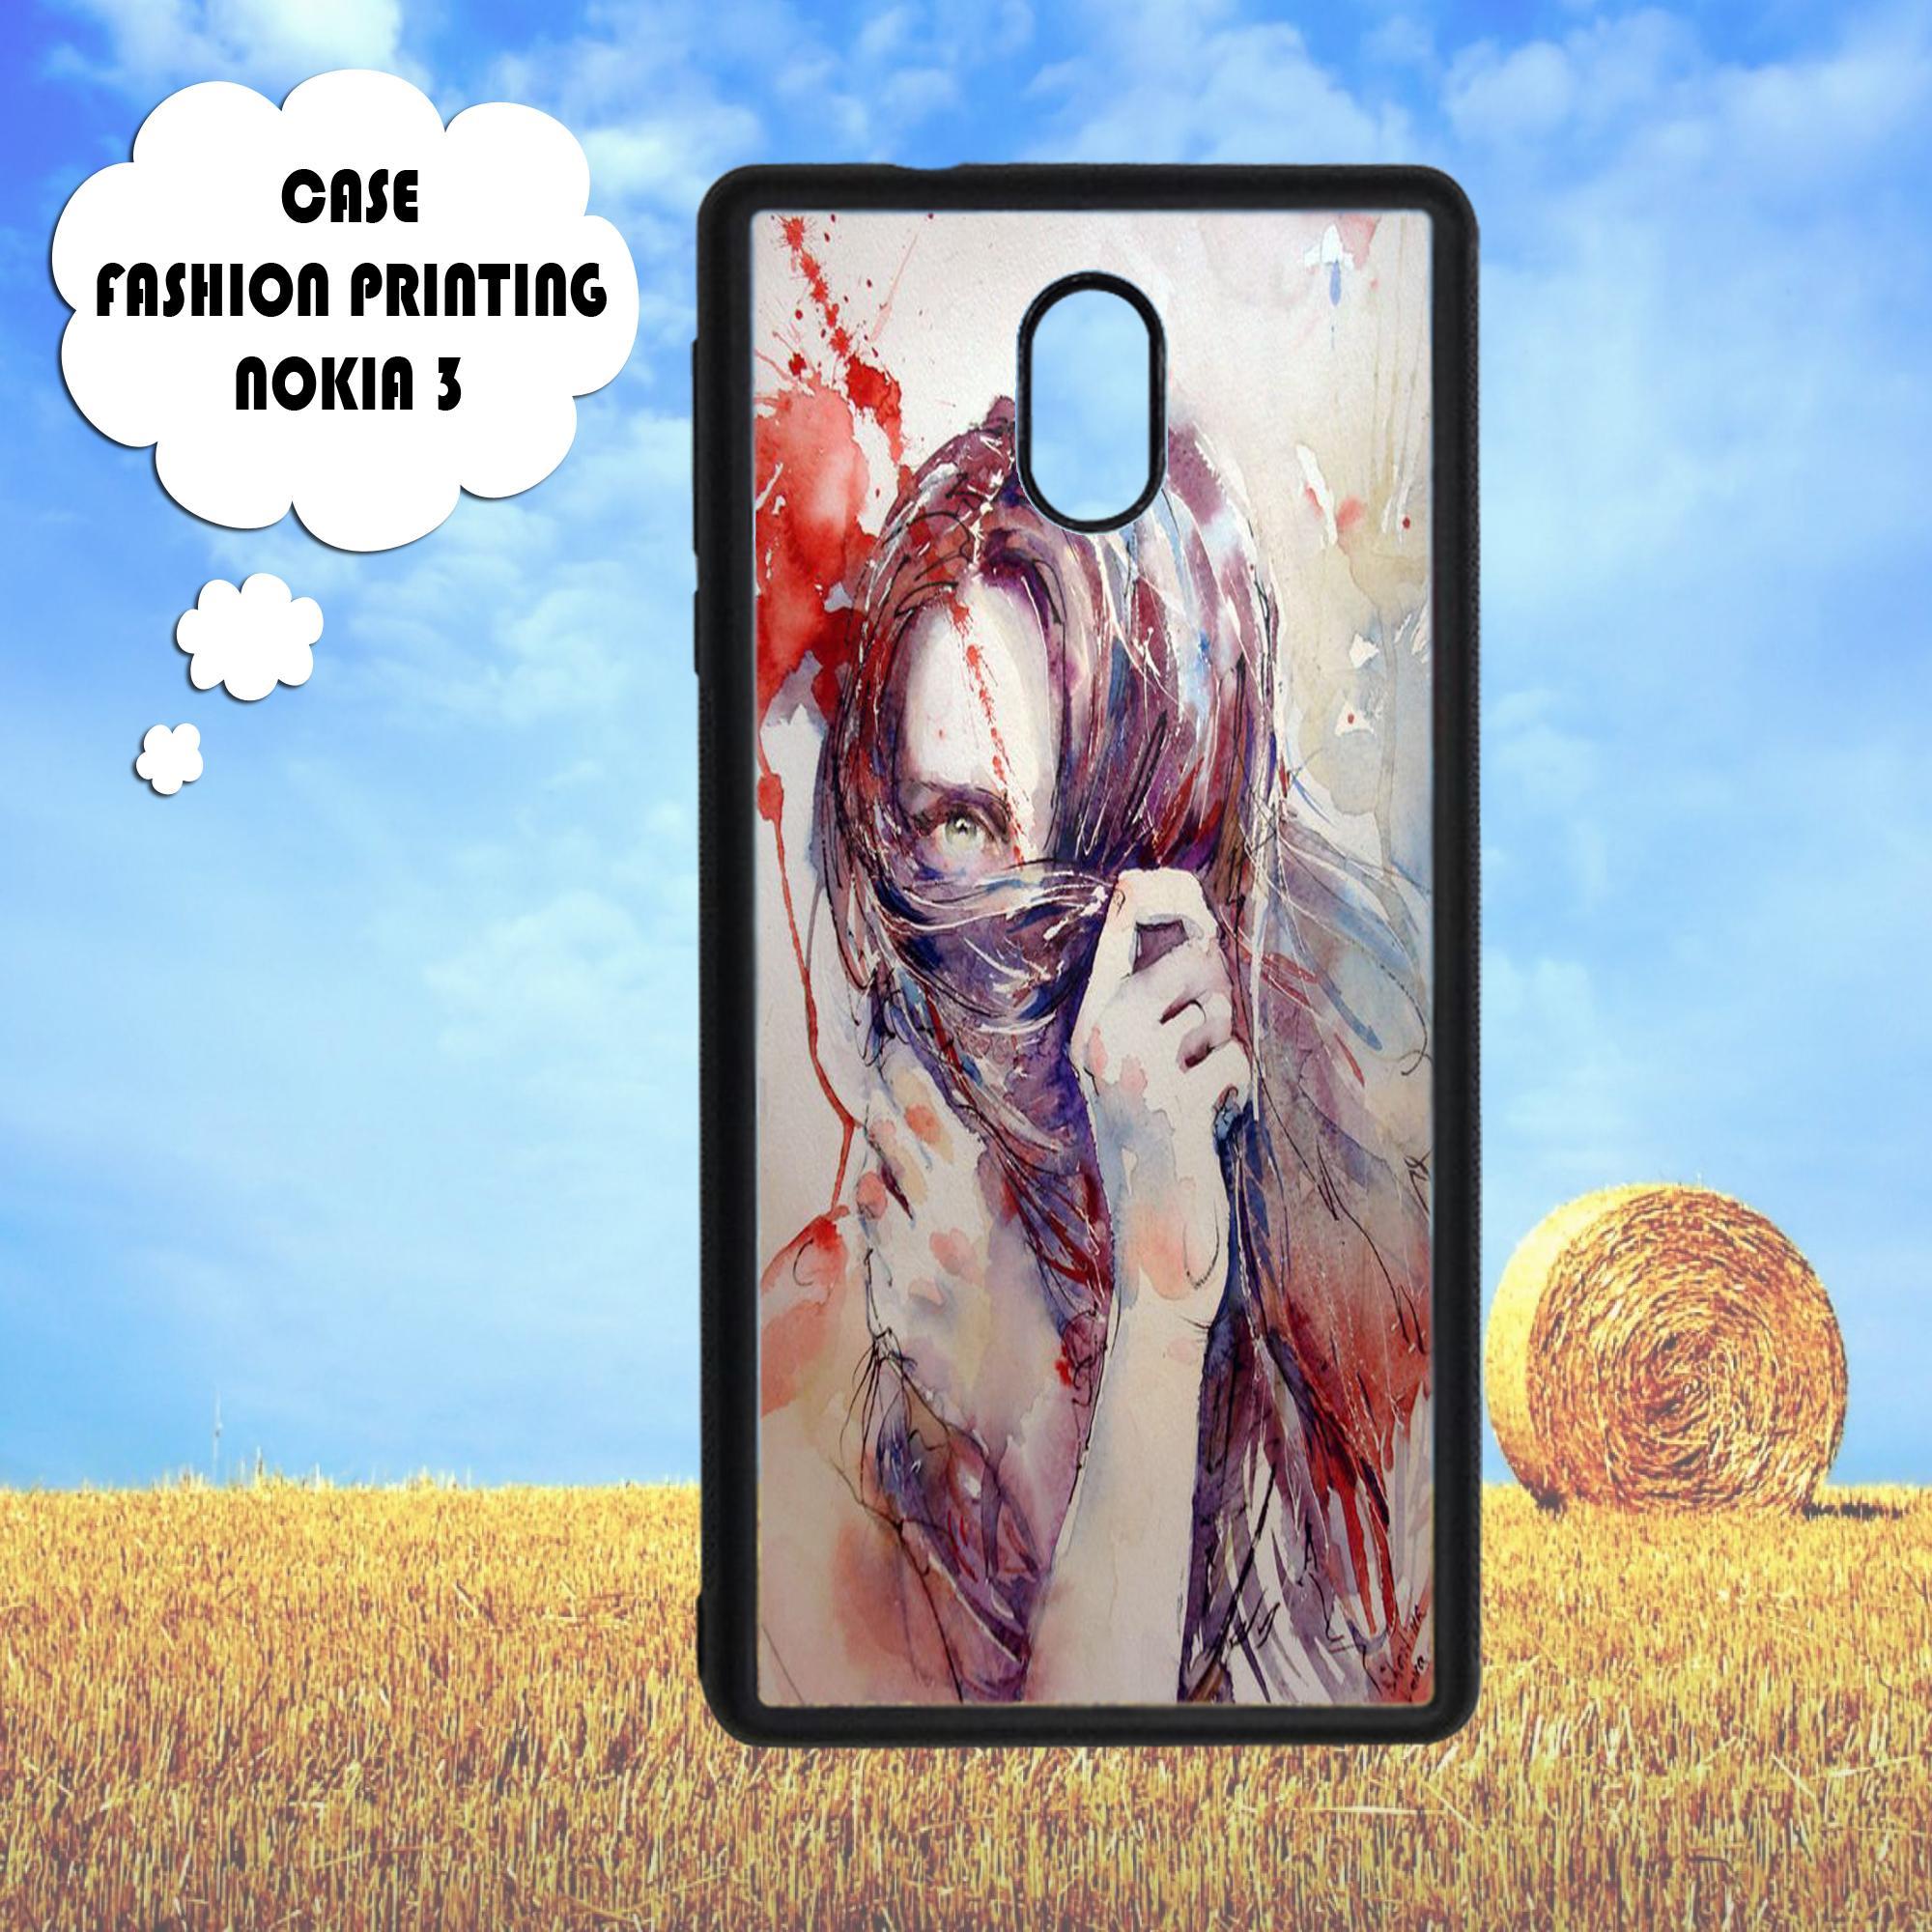 Rajamurah fasion printing case Nokia3 - 2